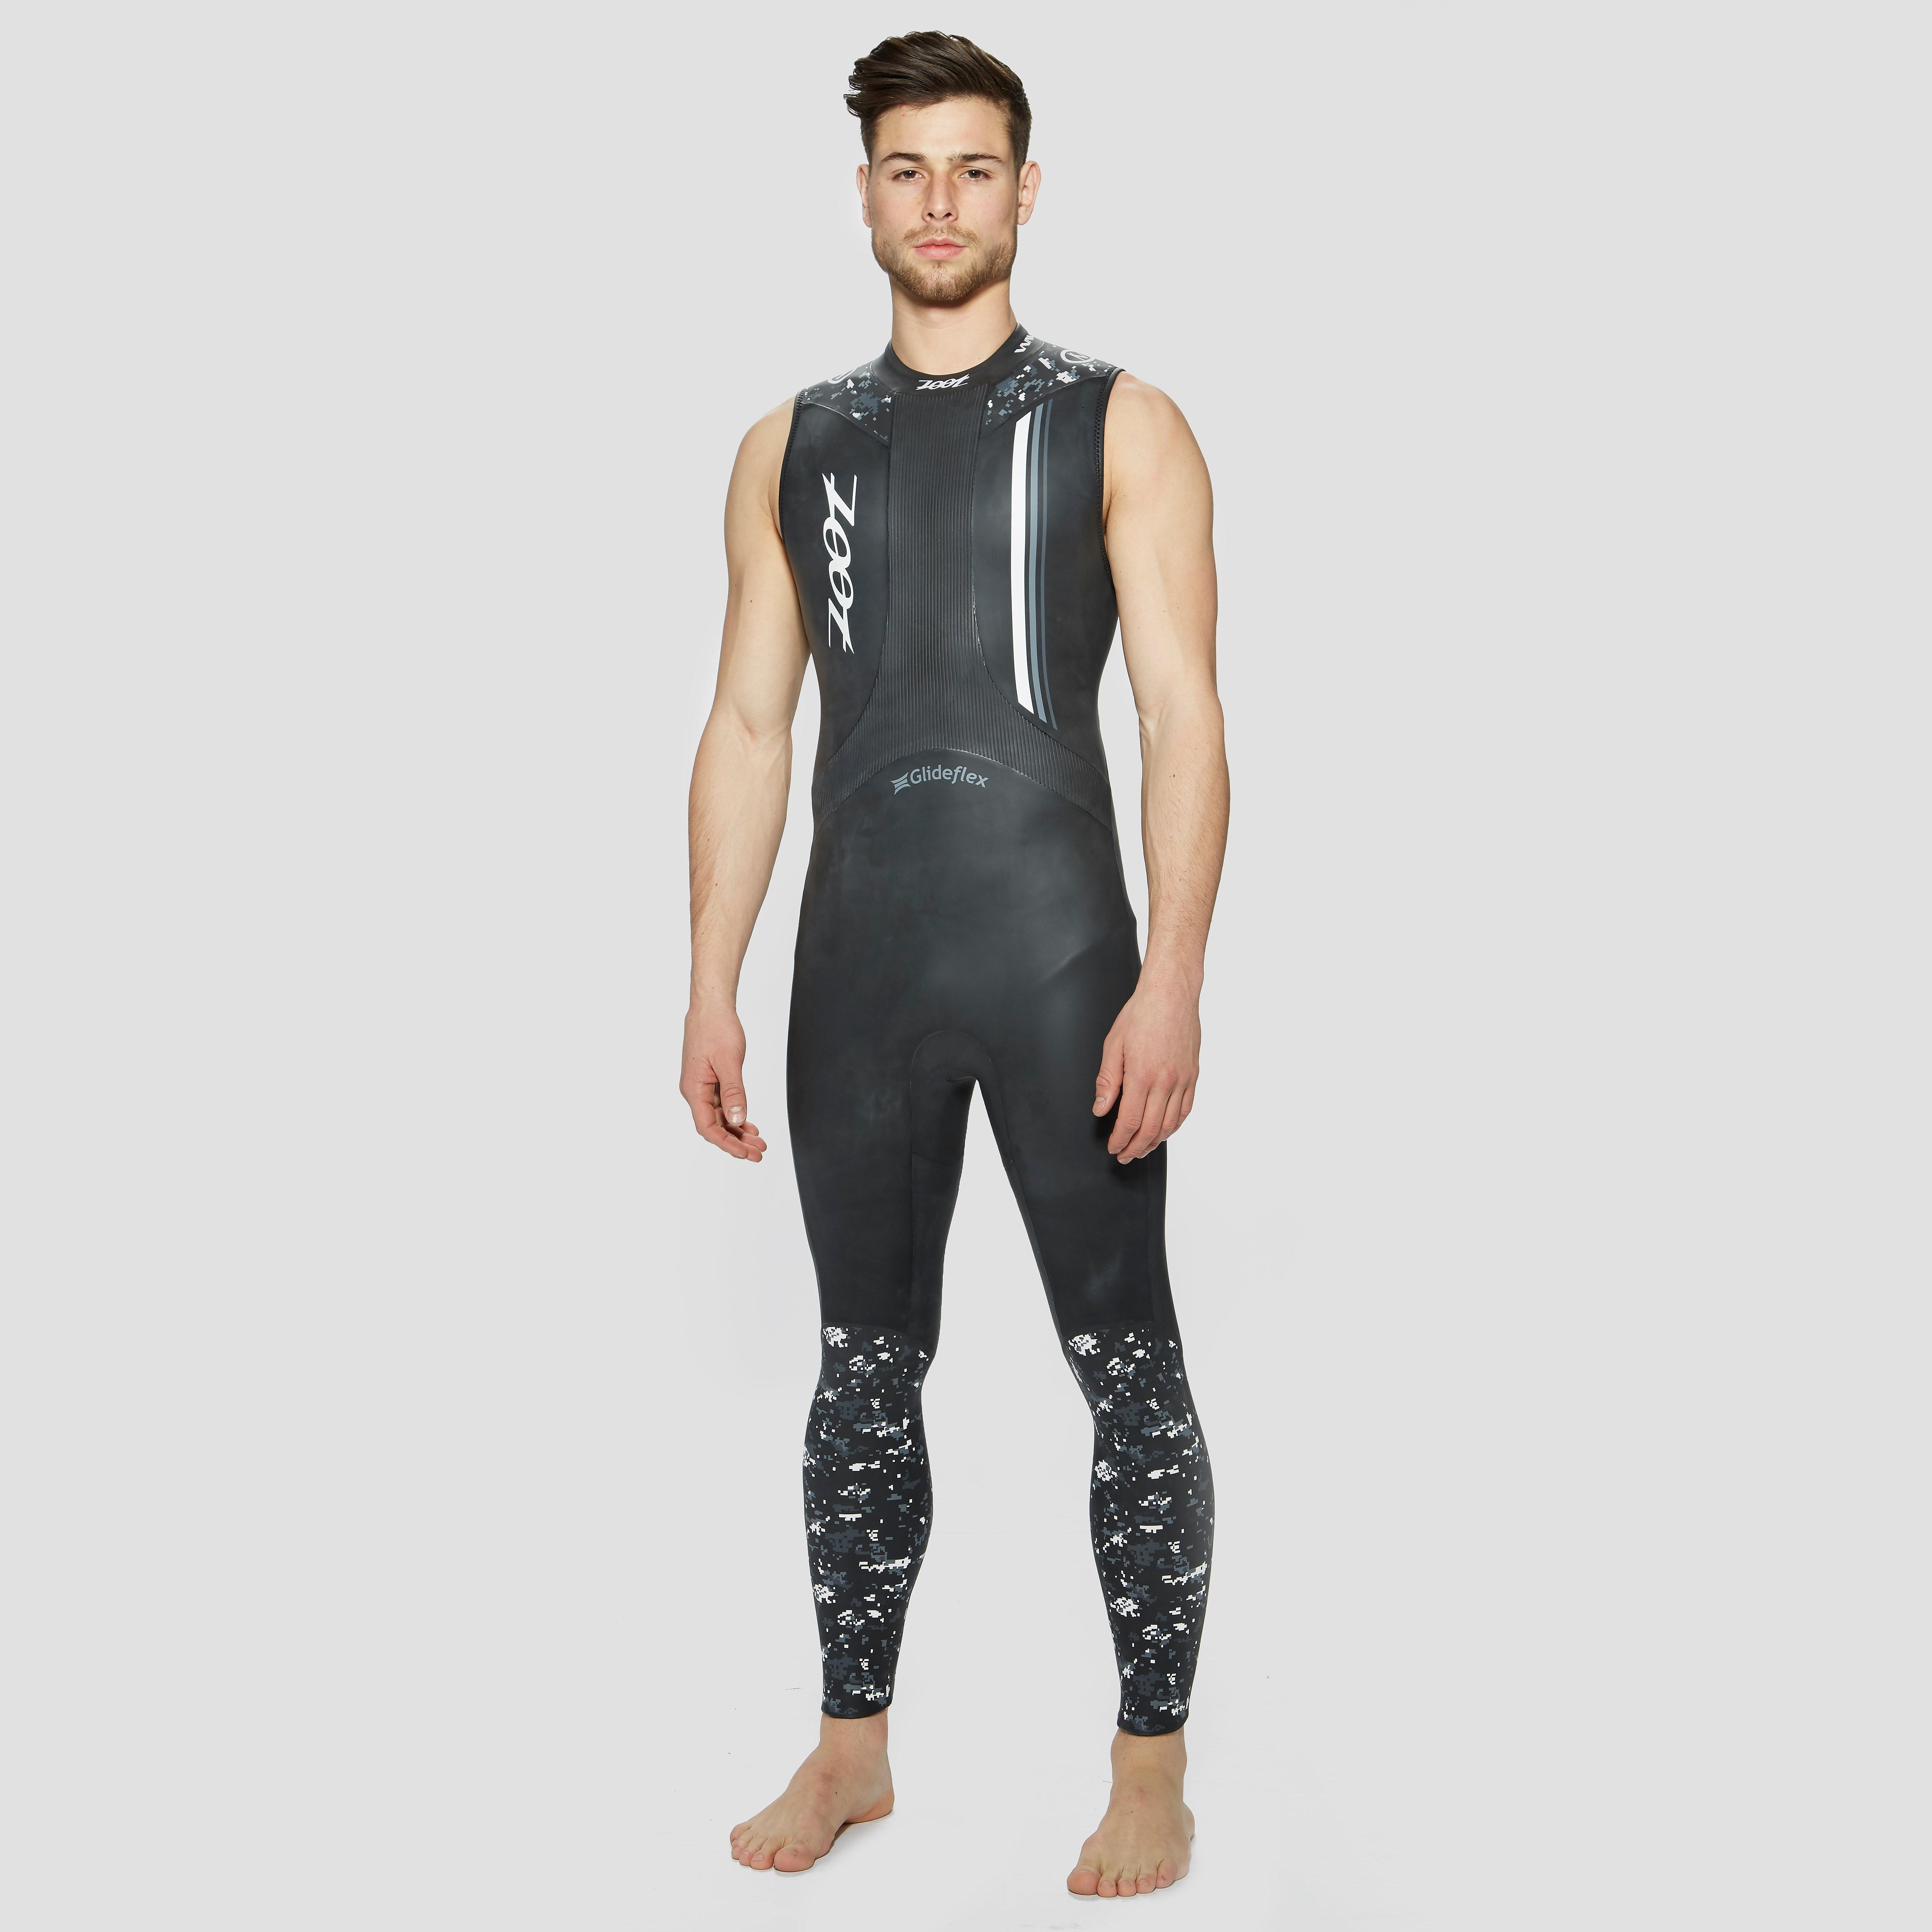 Zoot Wave 1 Sleeveless Men's Wetsuit